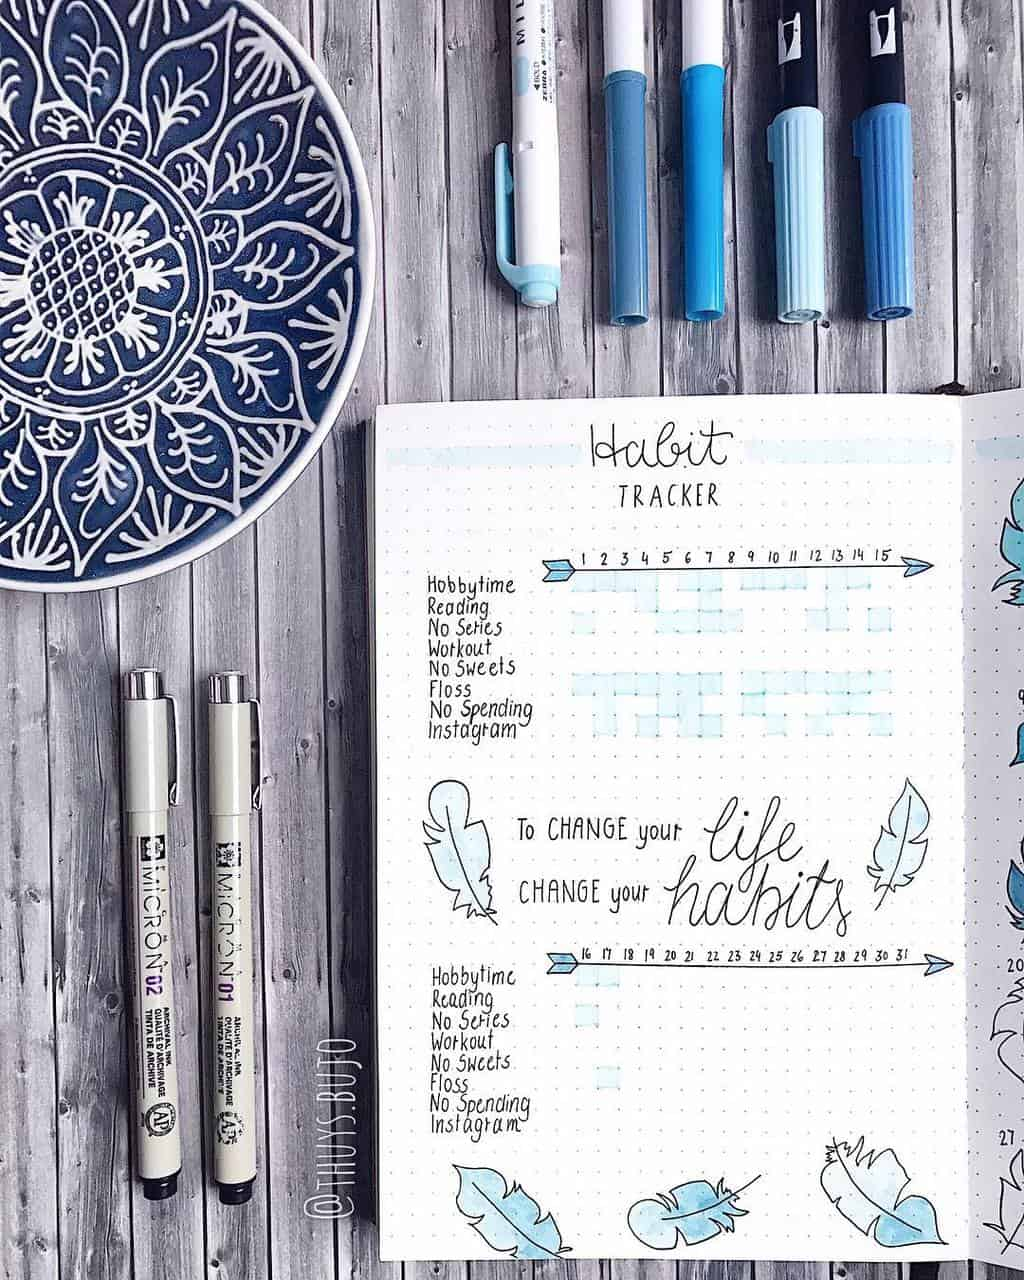 Boho Bullet Journal Theme Inspirations - spread by @thuys.bujo | Masha Plans